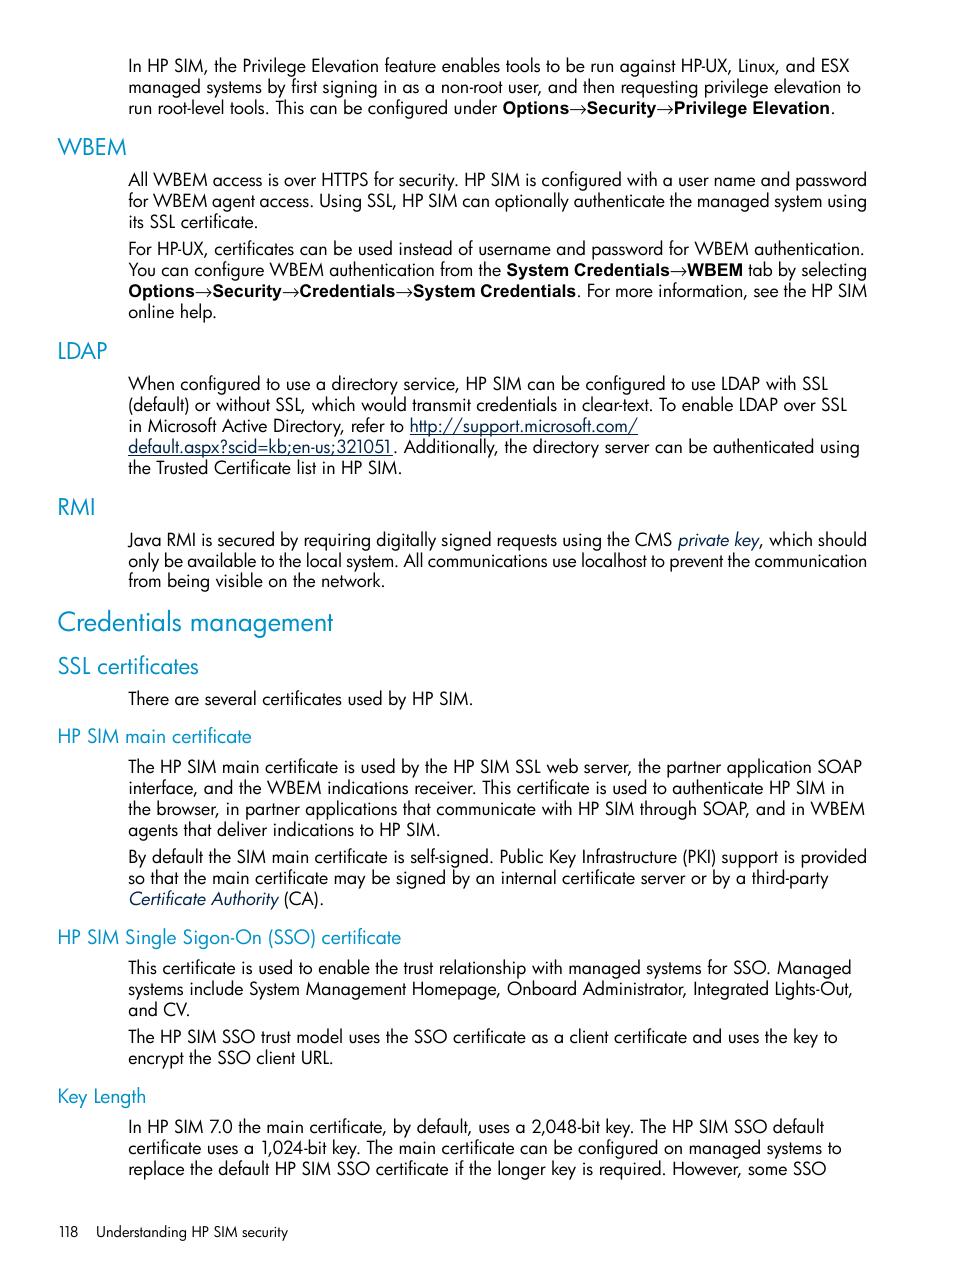 Wbem Ldap Credentials Management Hp Systems Insight Manager User